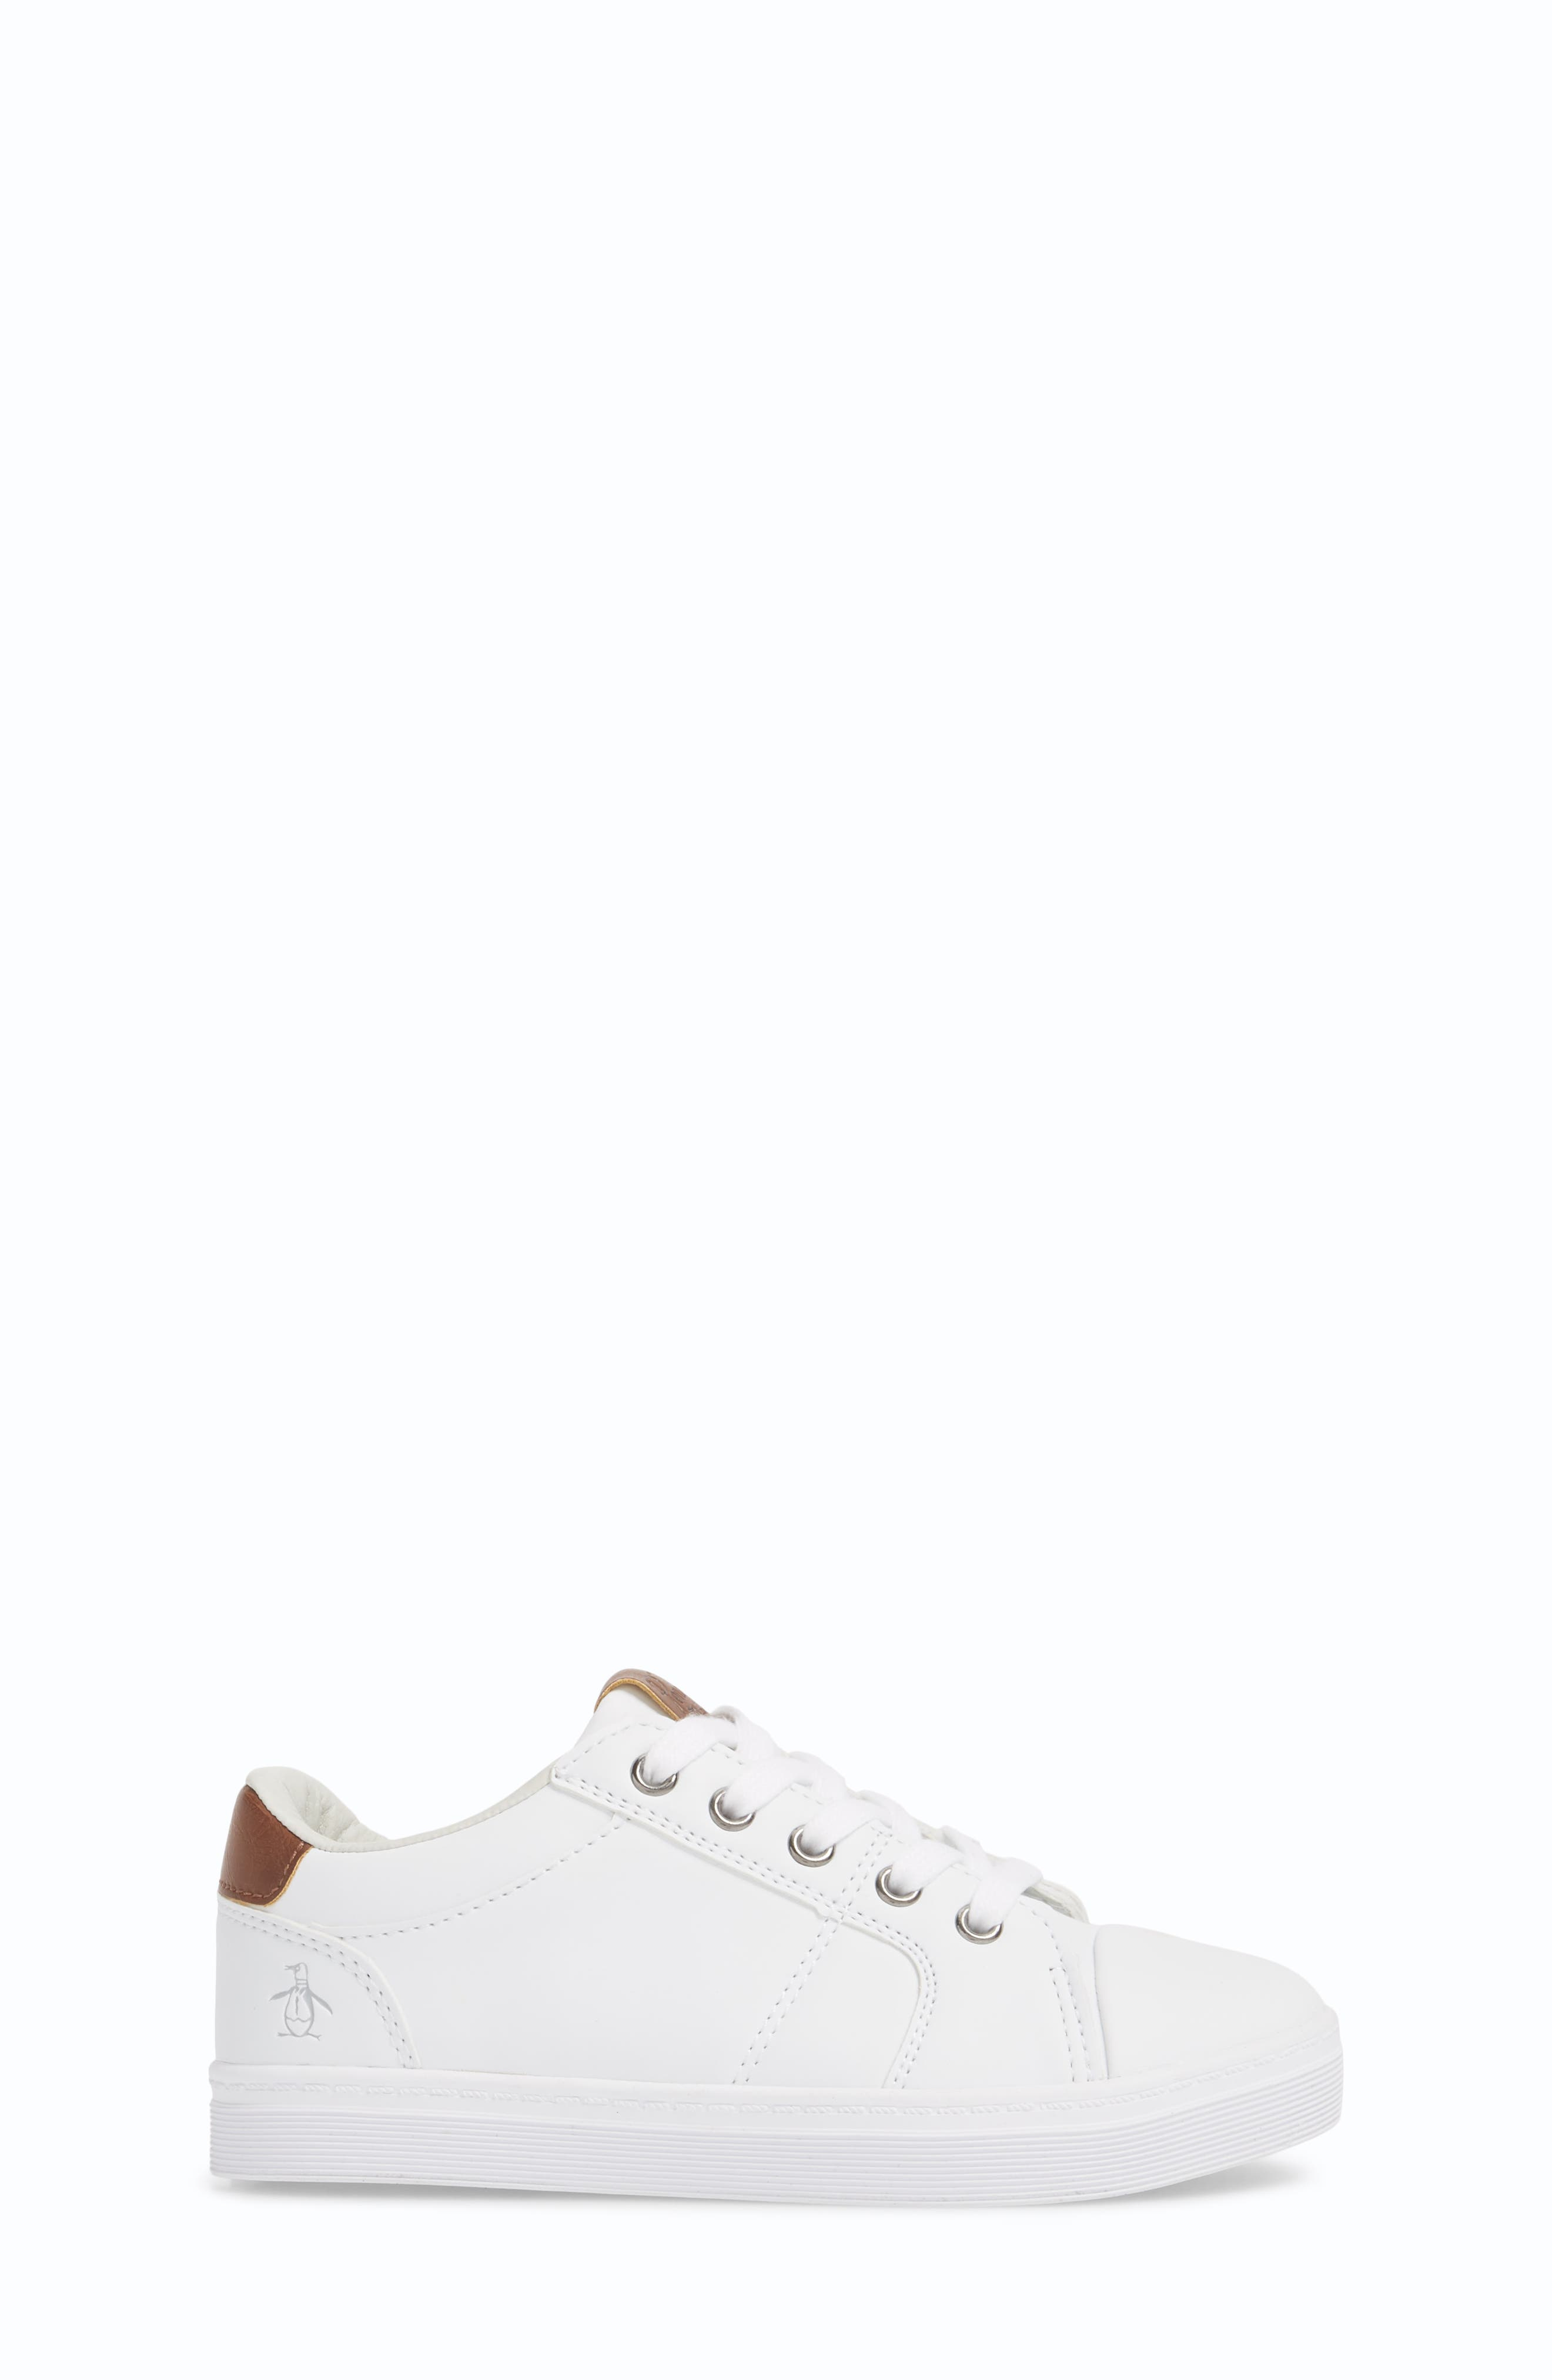 Cobin Sneaker,                             Alternate thumbnail 3, color,                             White/ Cognac